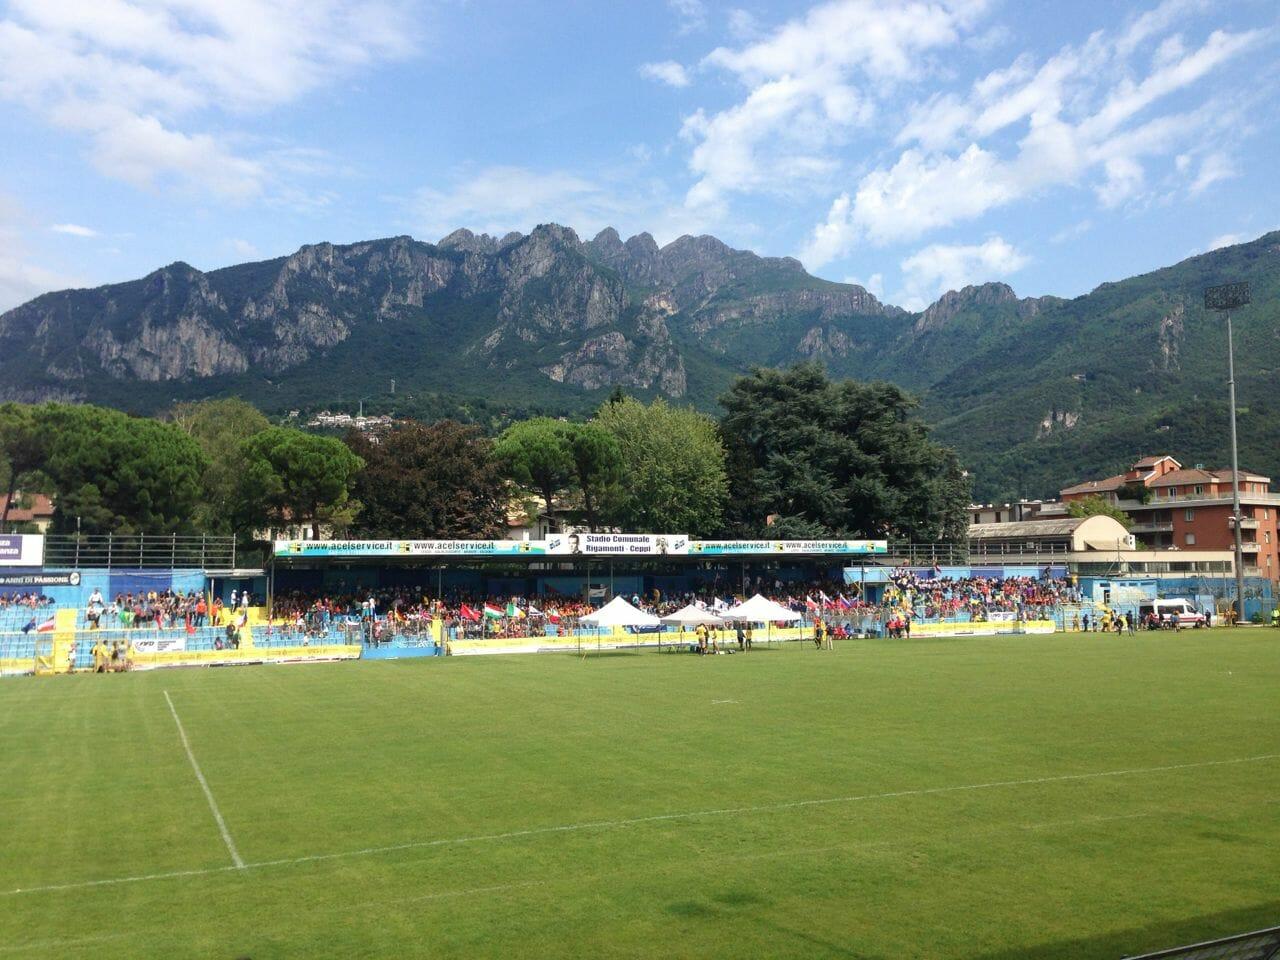 The beautiful stadium setting in Lecco.